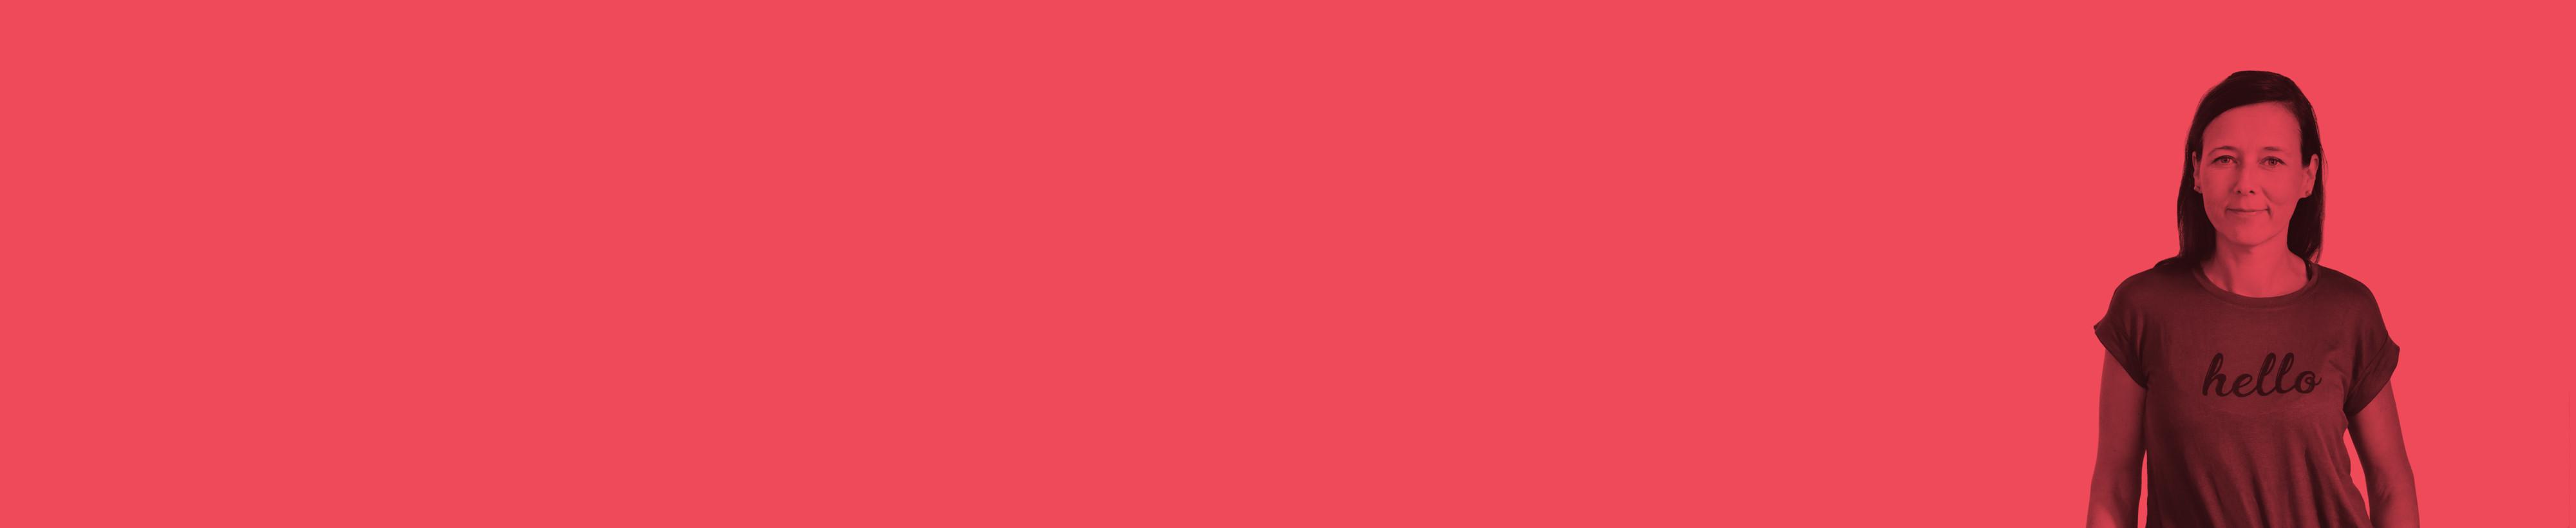 dlc-carla-reckling-farbe-1